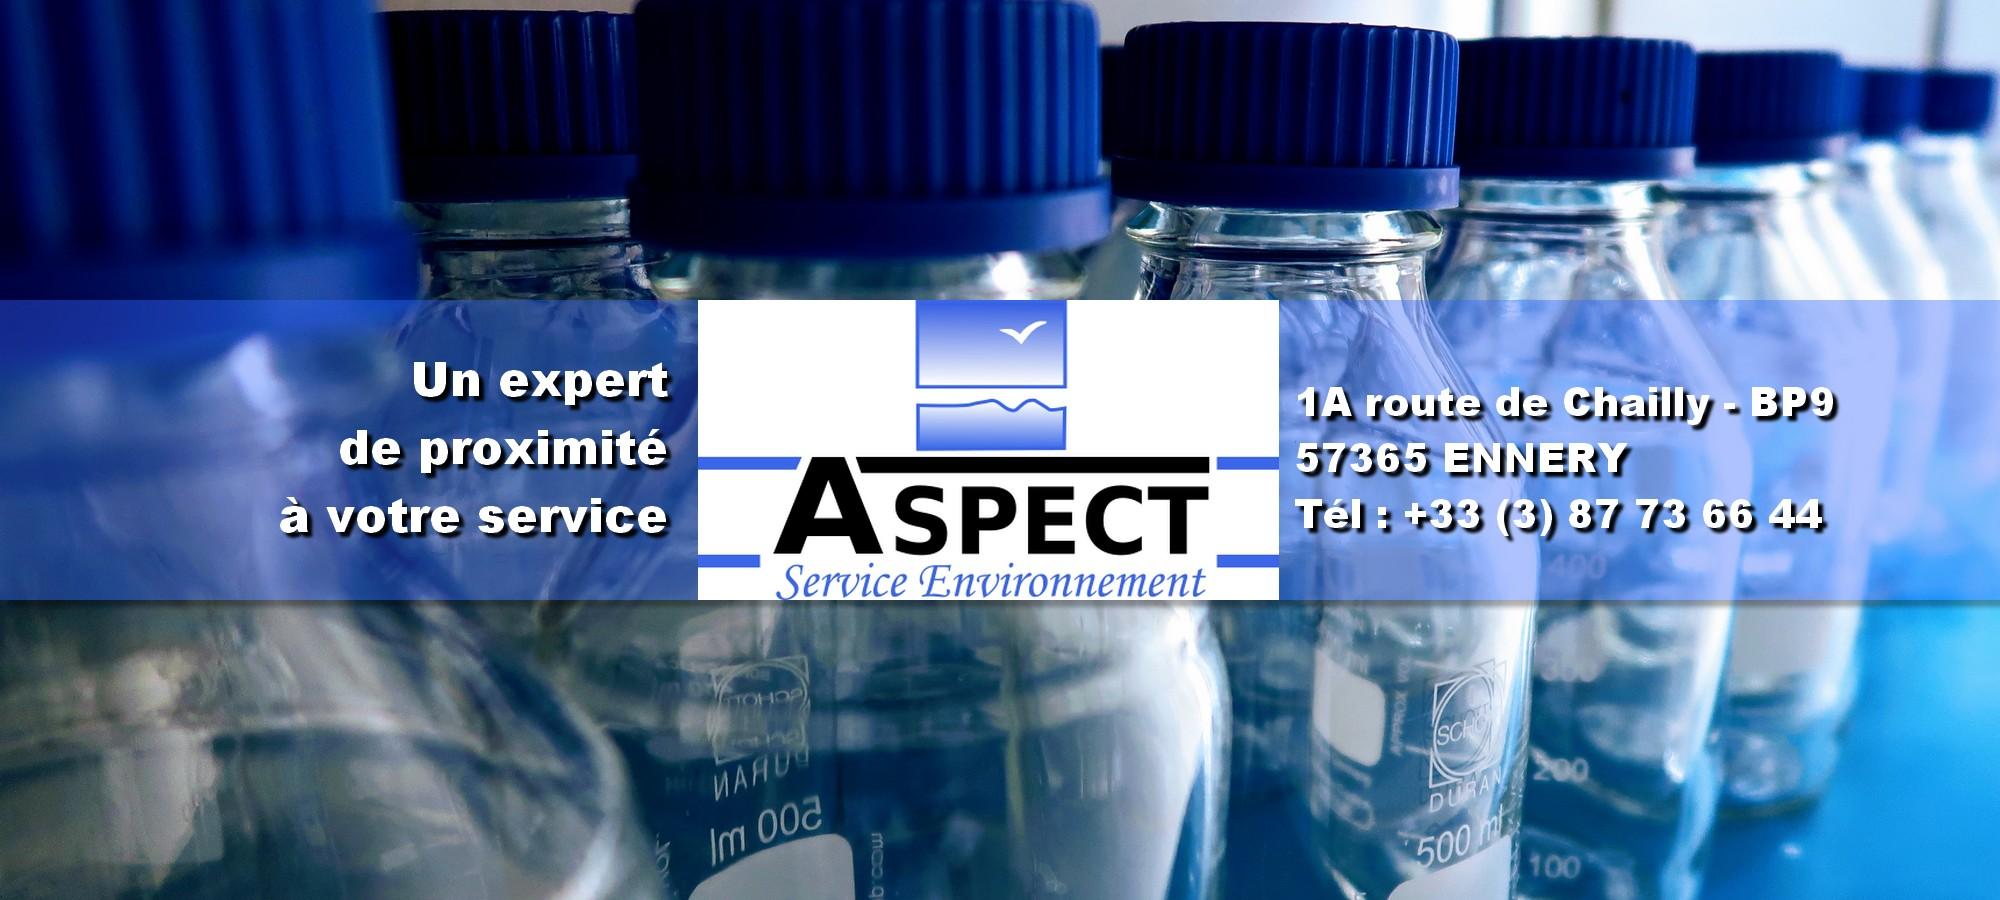 ASPECT Service Environnement